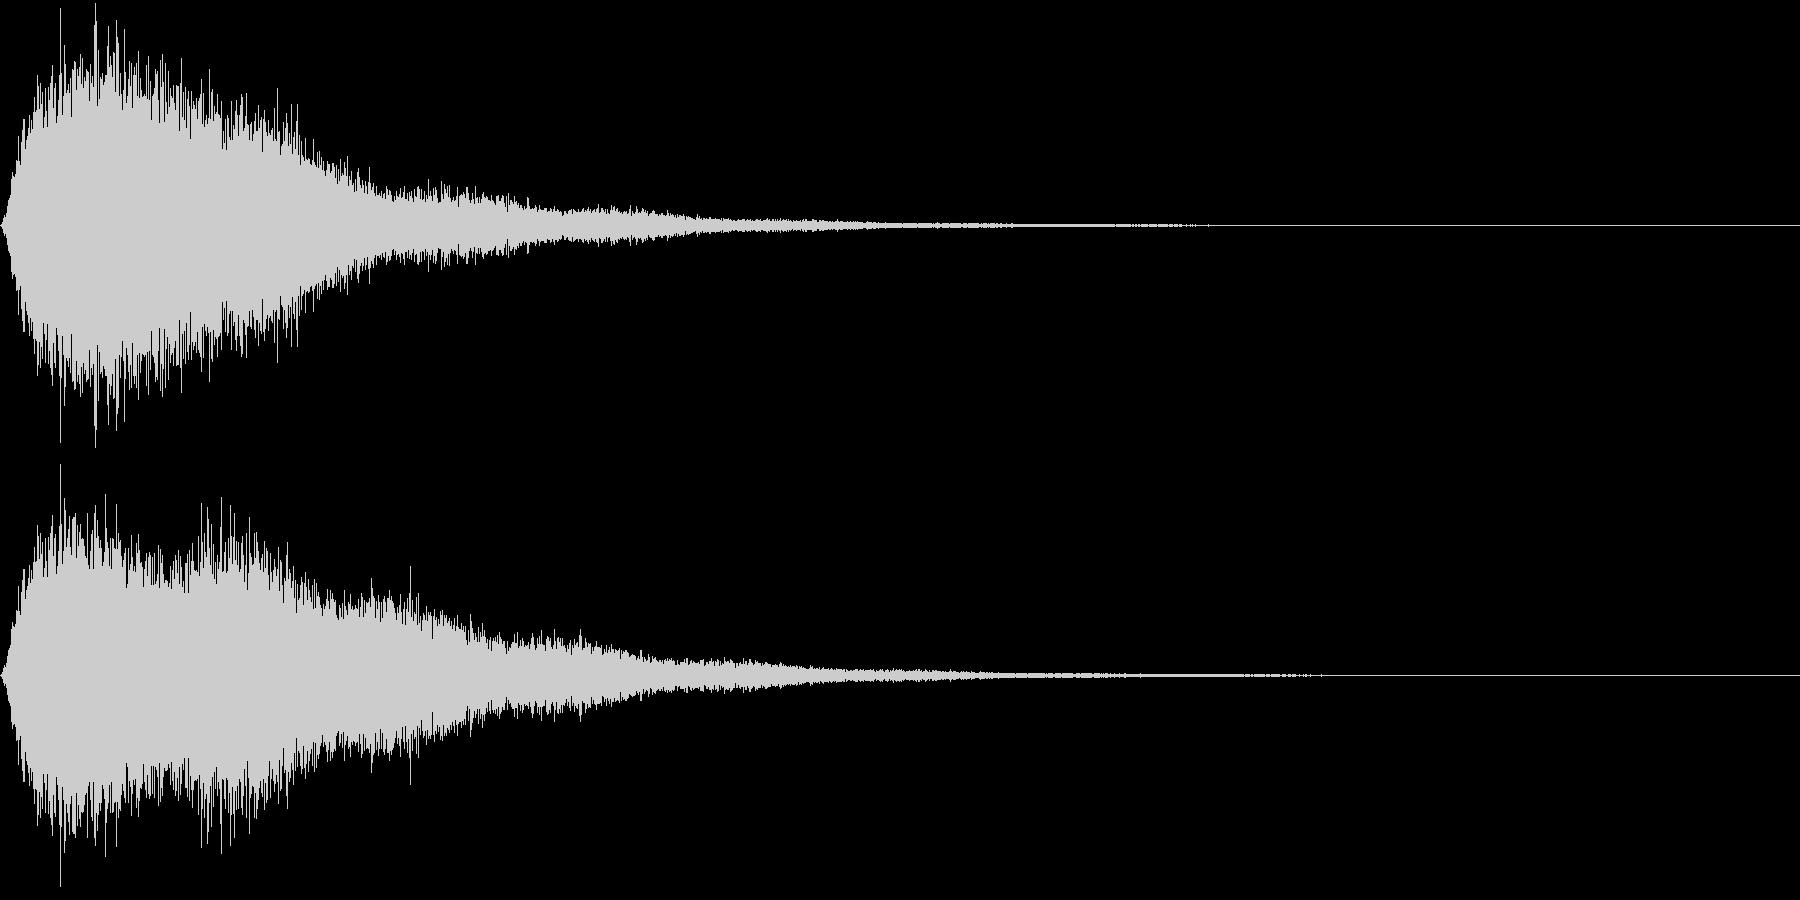 SE 一瞬の隙 攻撃 シャドー 落下にもの未再生の波形